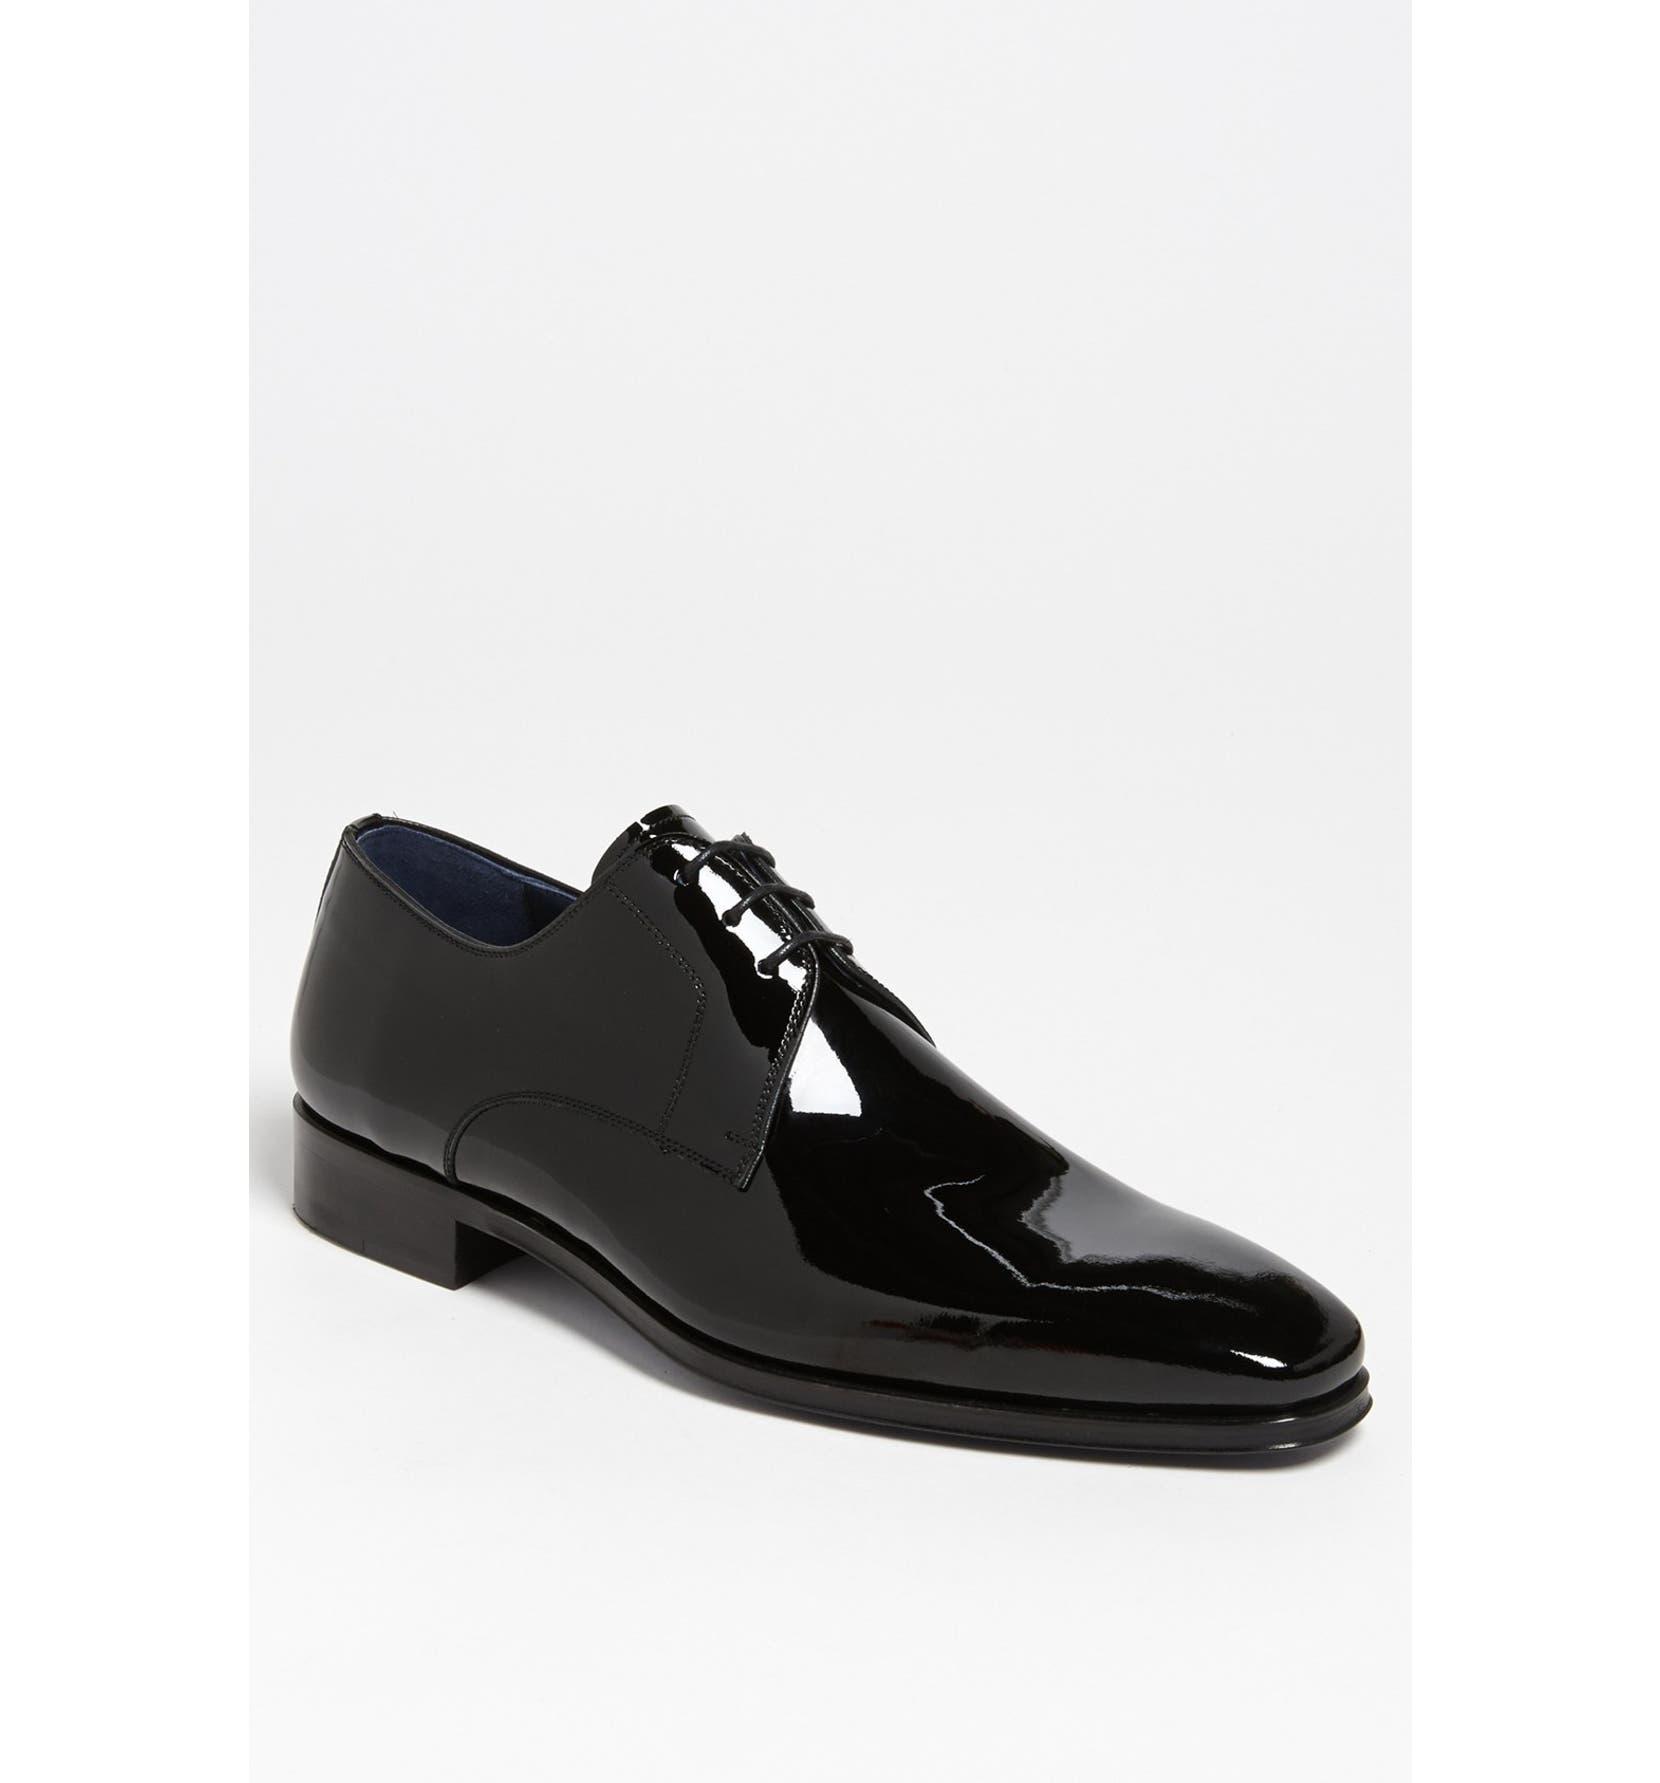 Magnanni  Dante  Plain Toe Derby  3f22bab8d60b2